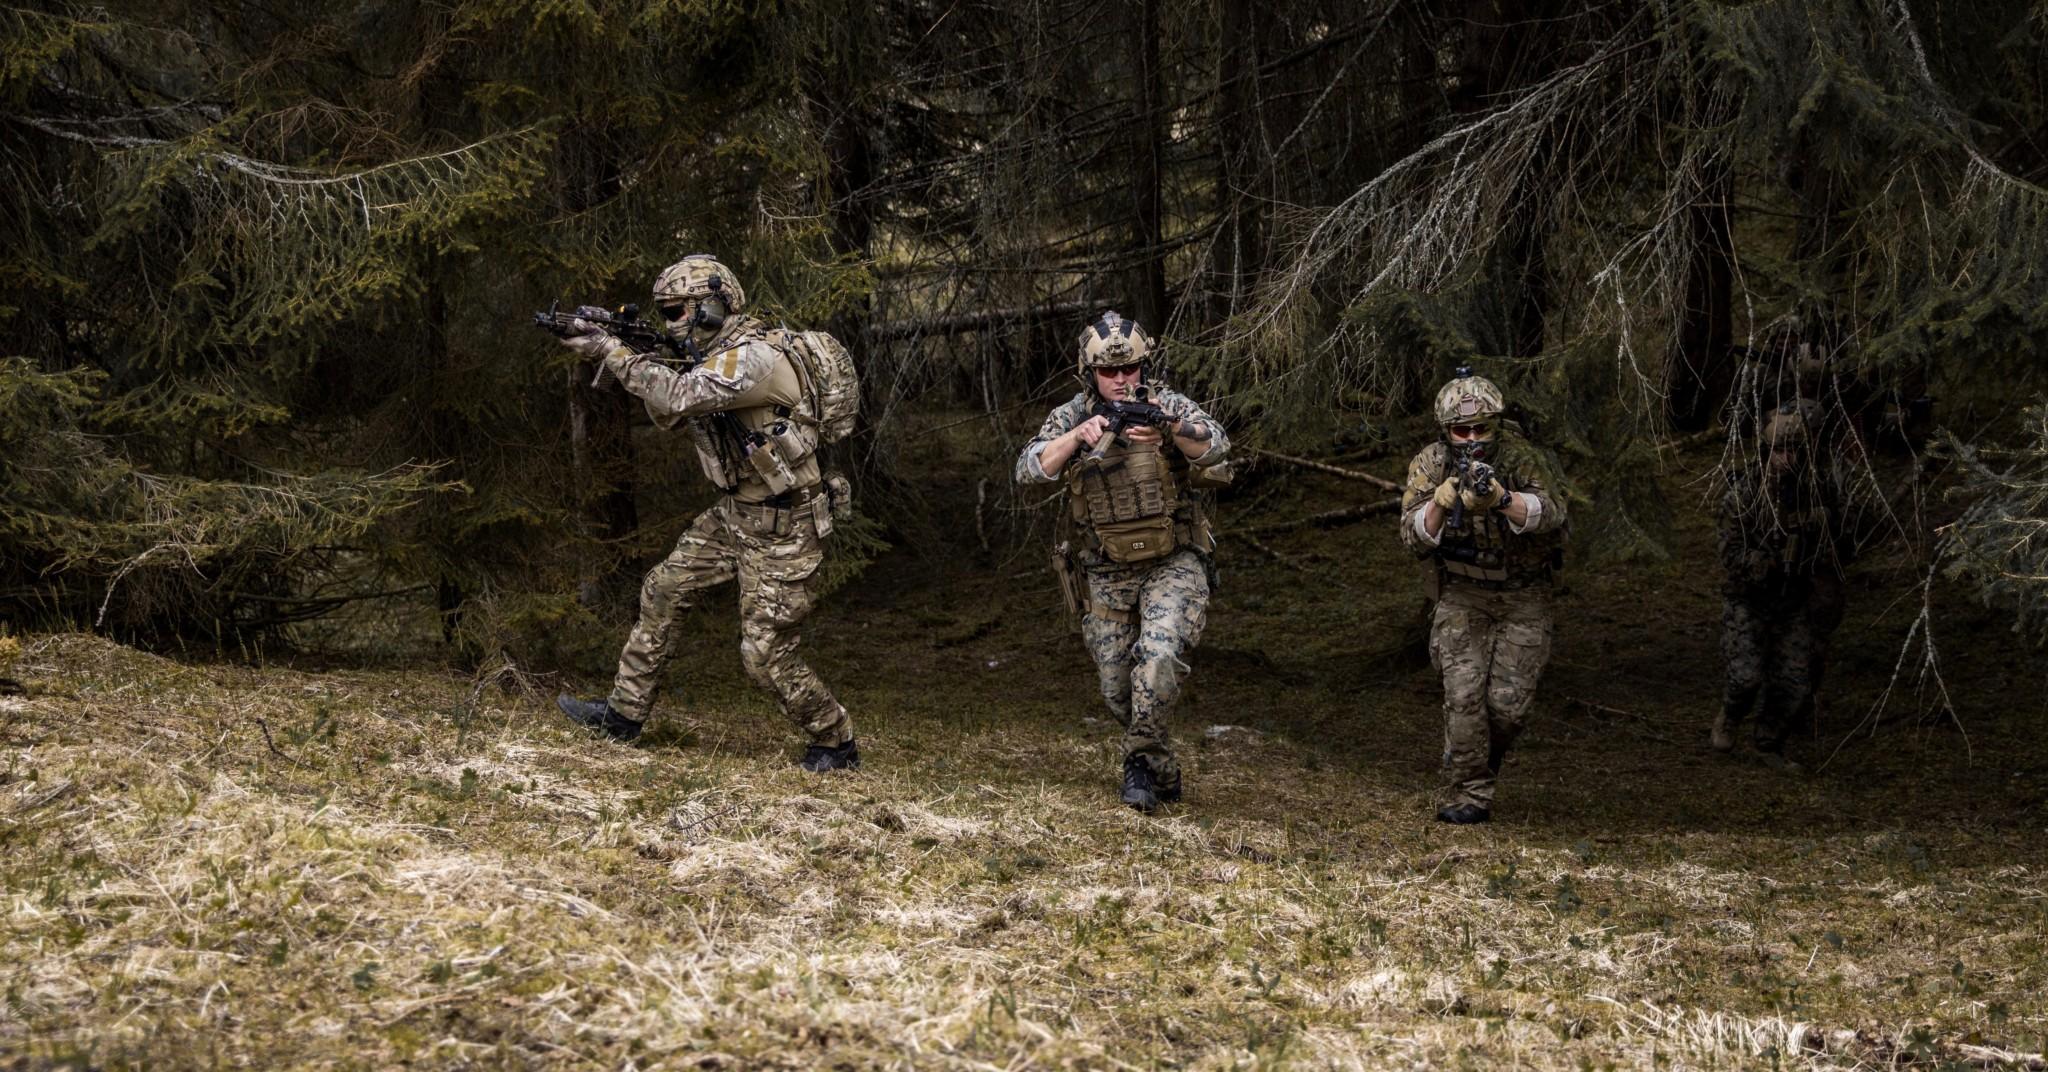 Norsk forsvarsplanlegging er en skandale